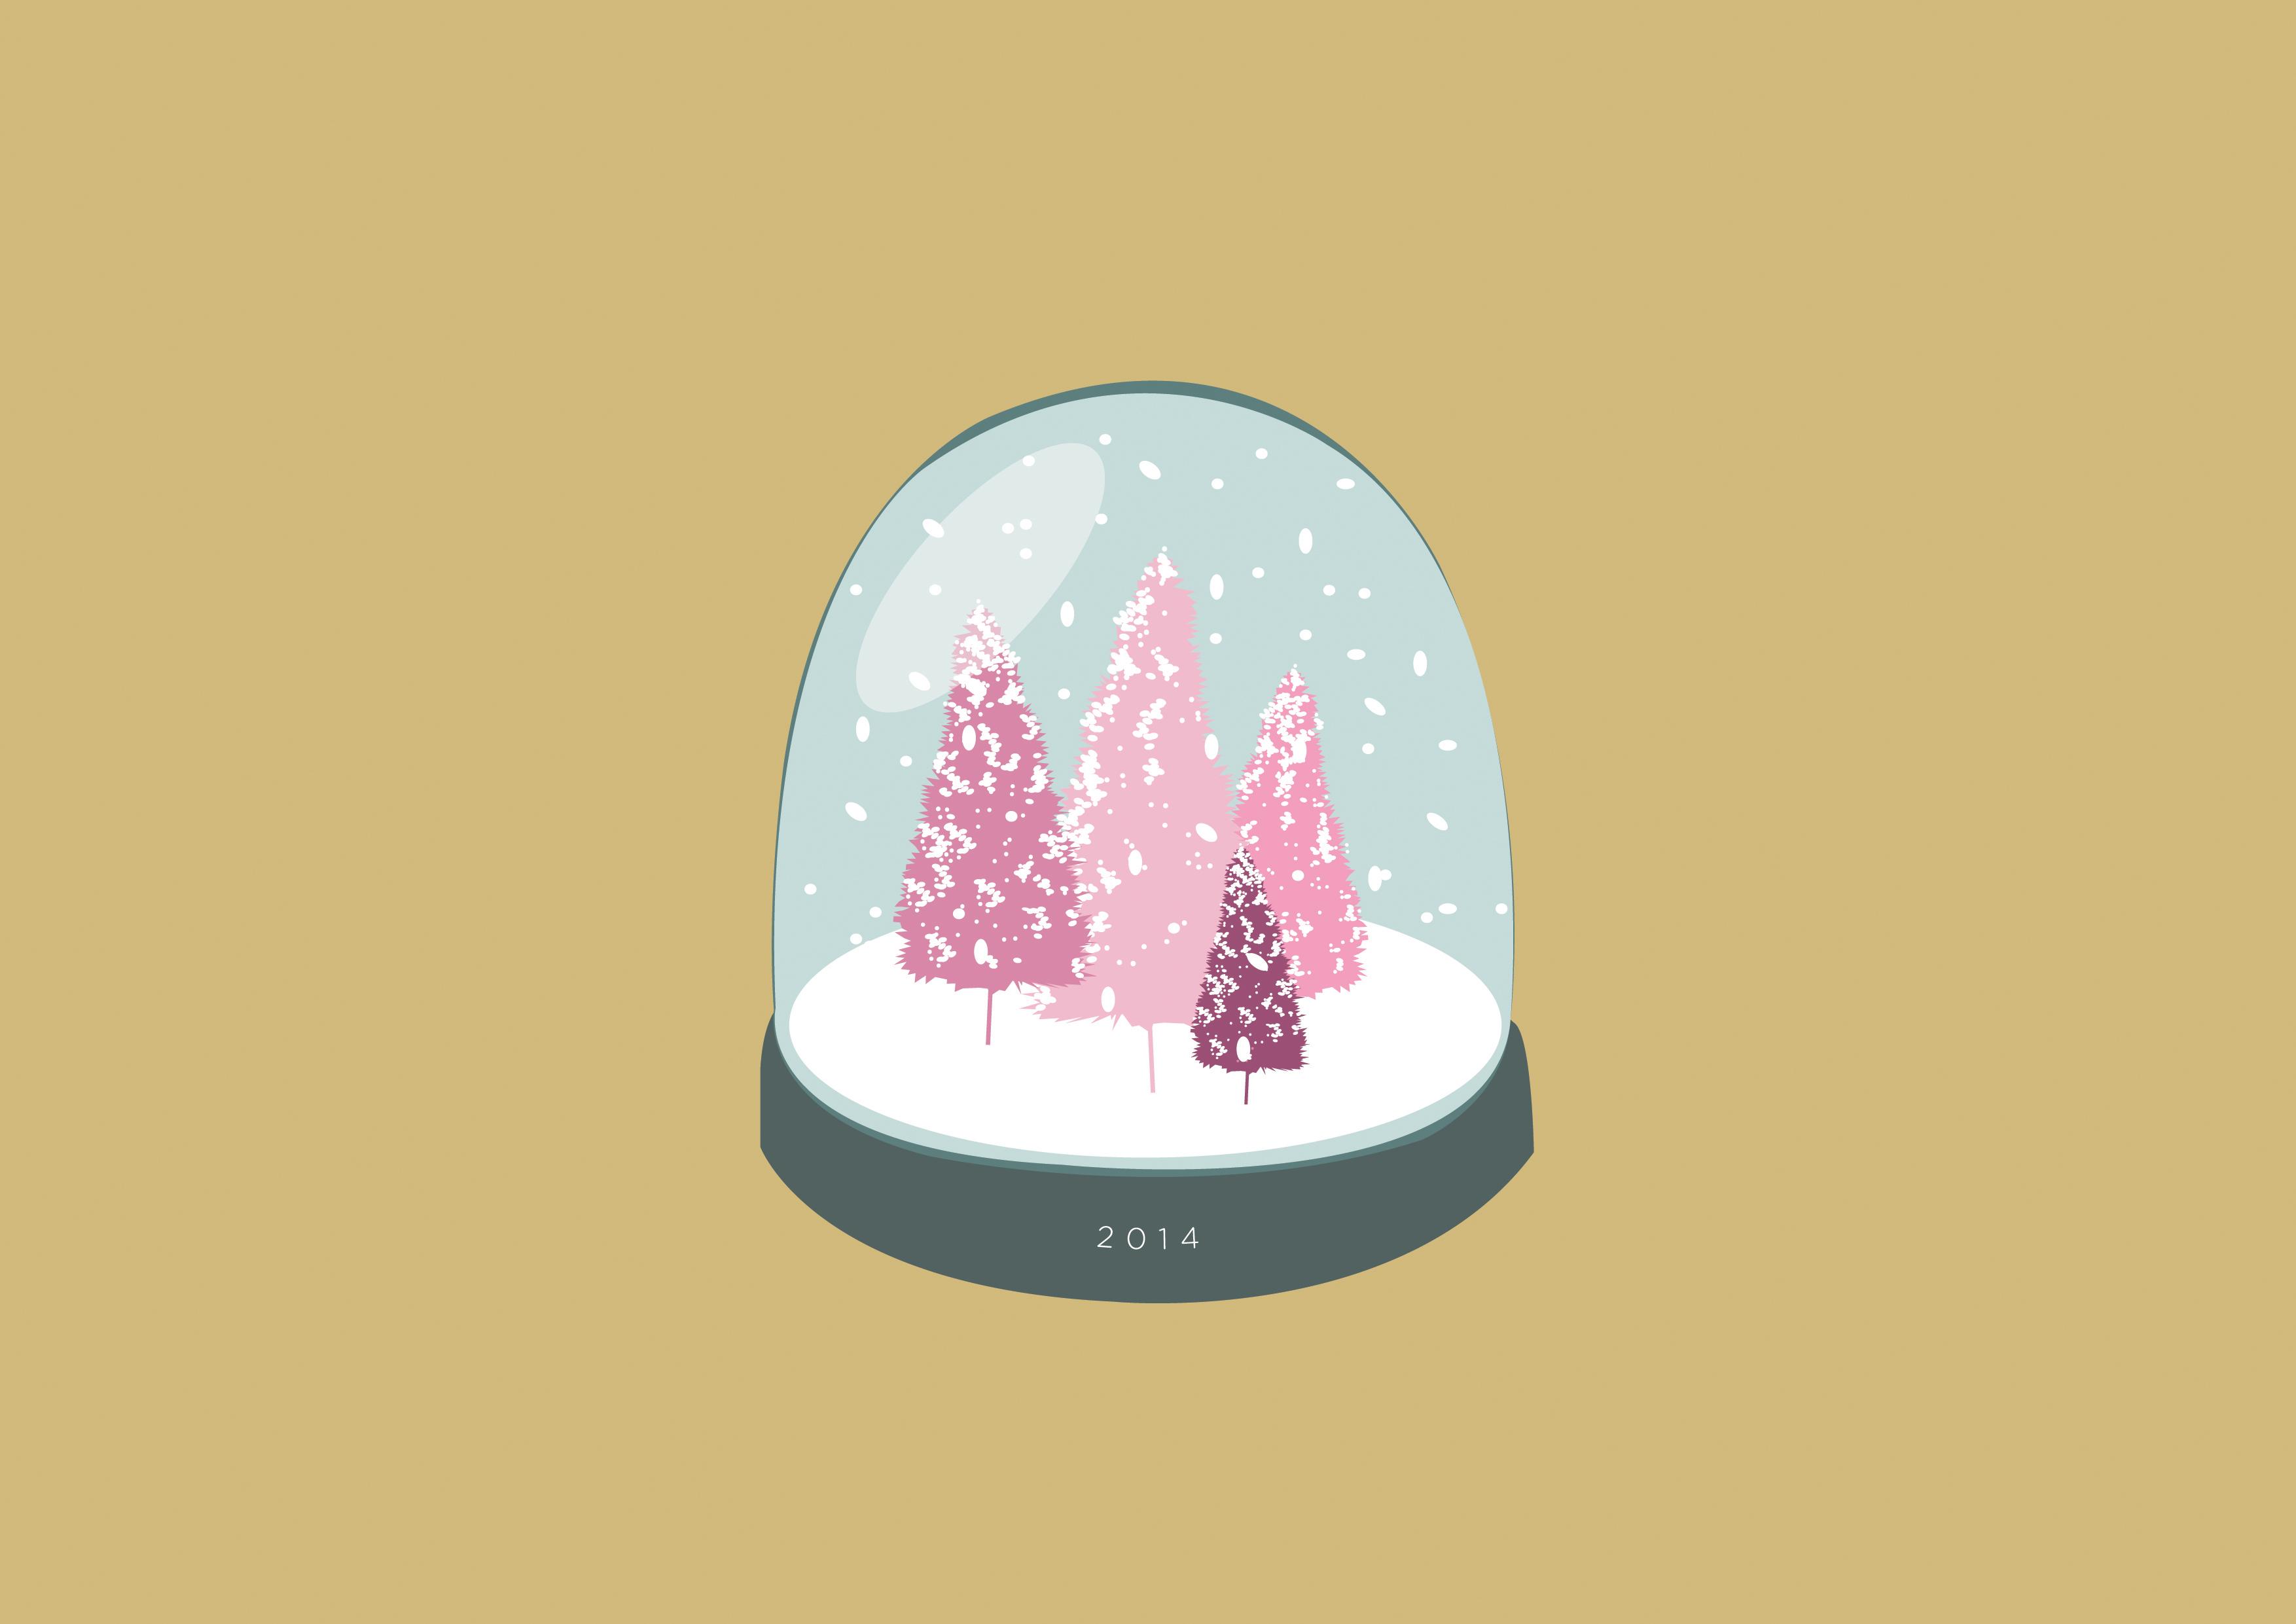 snowglobe_rvb